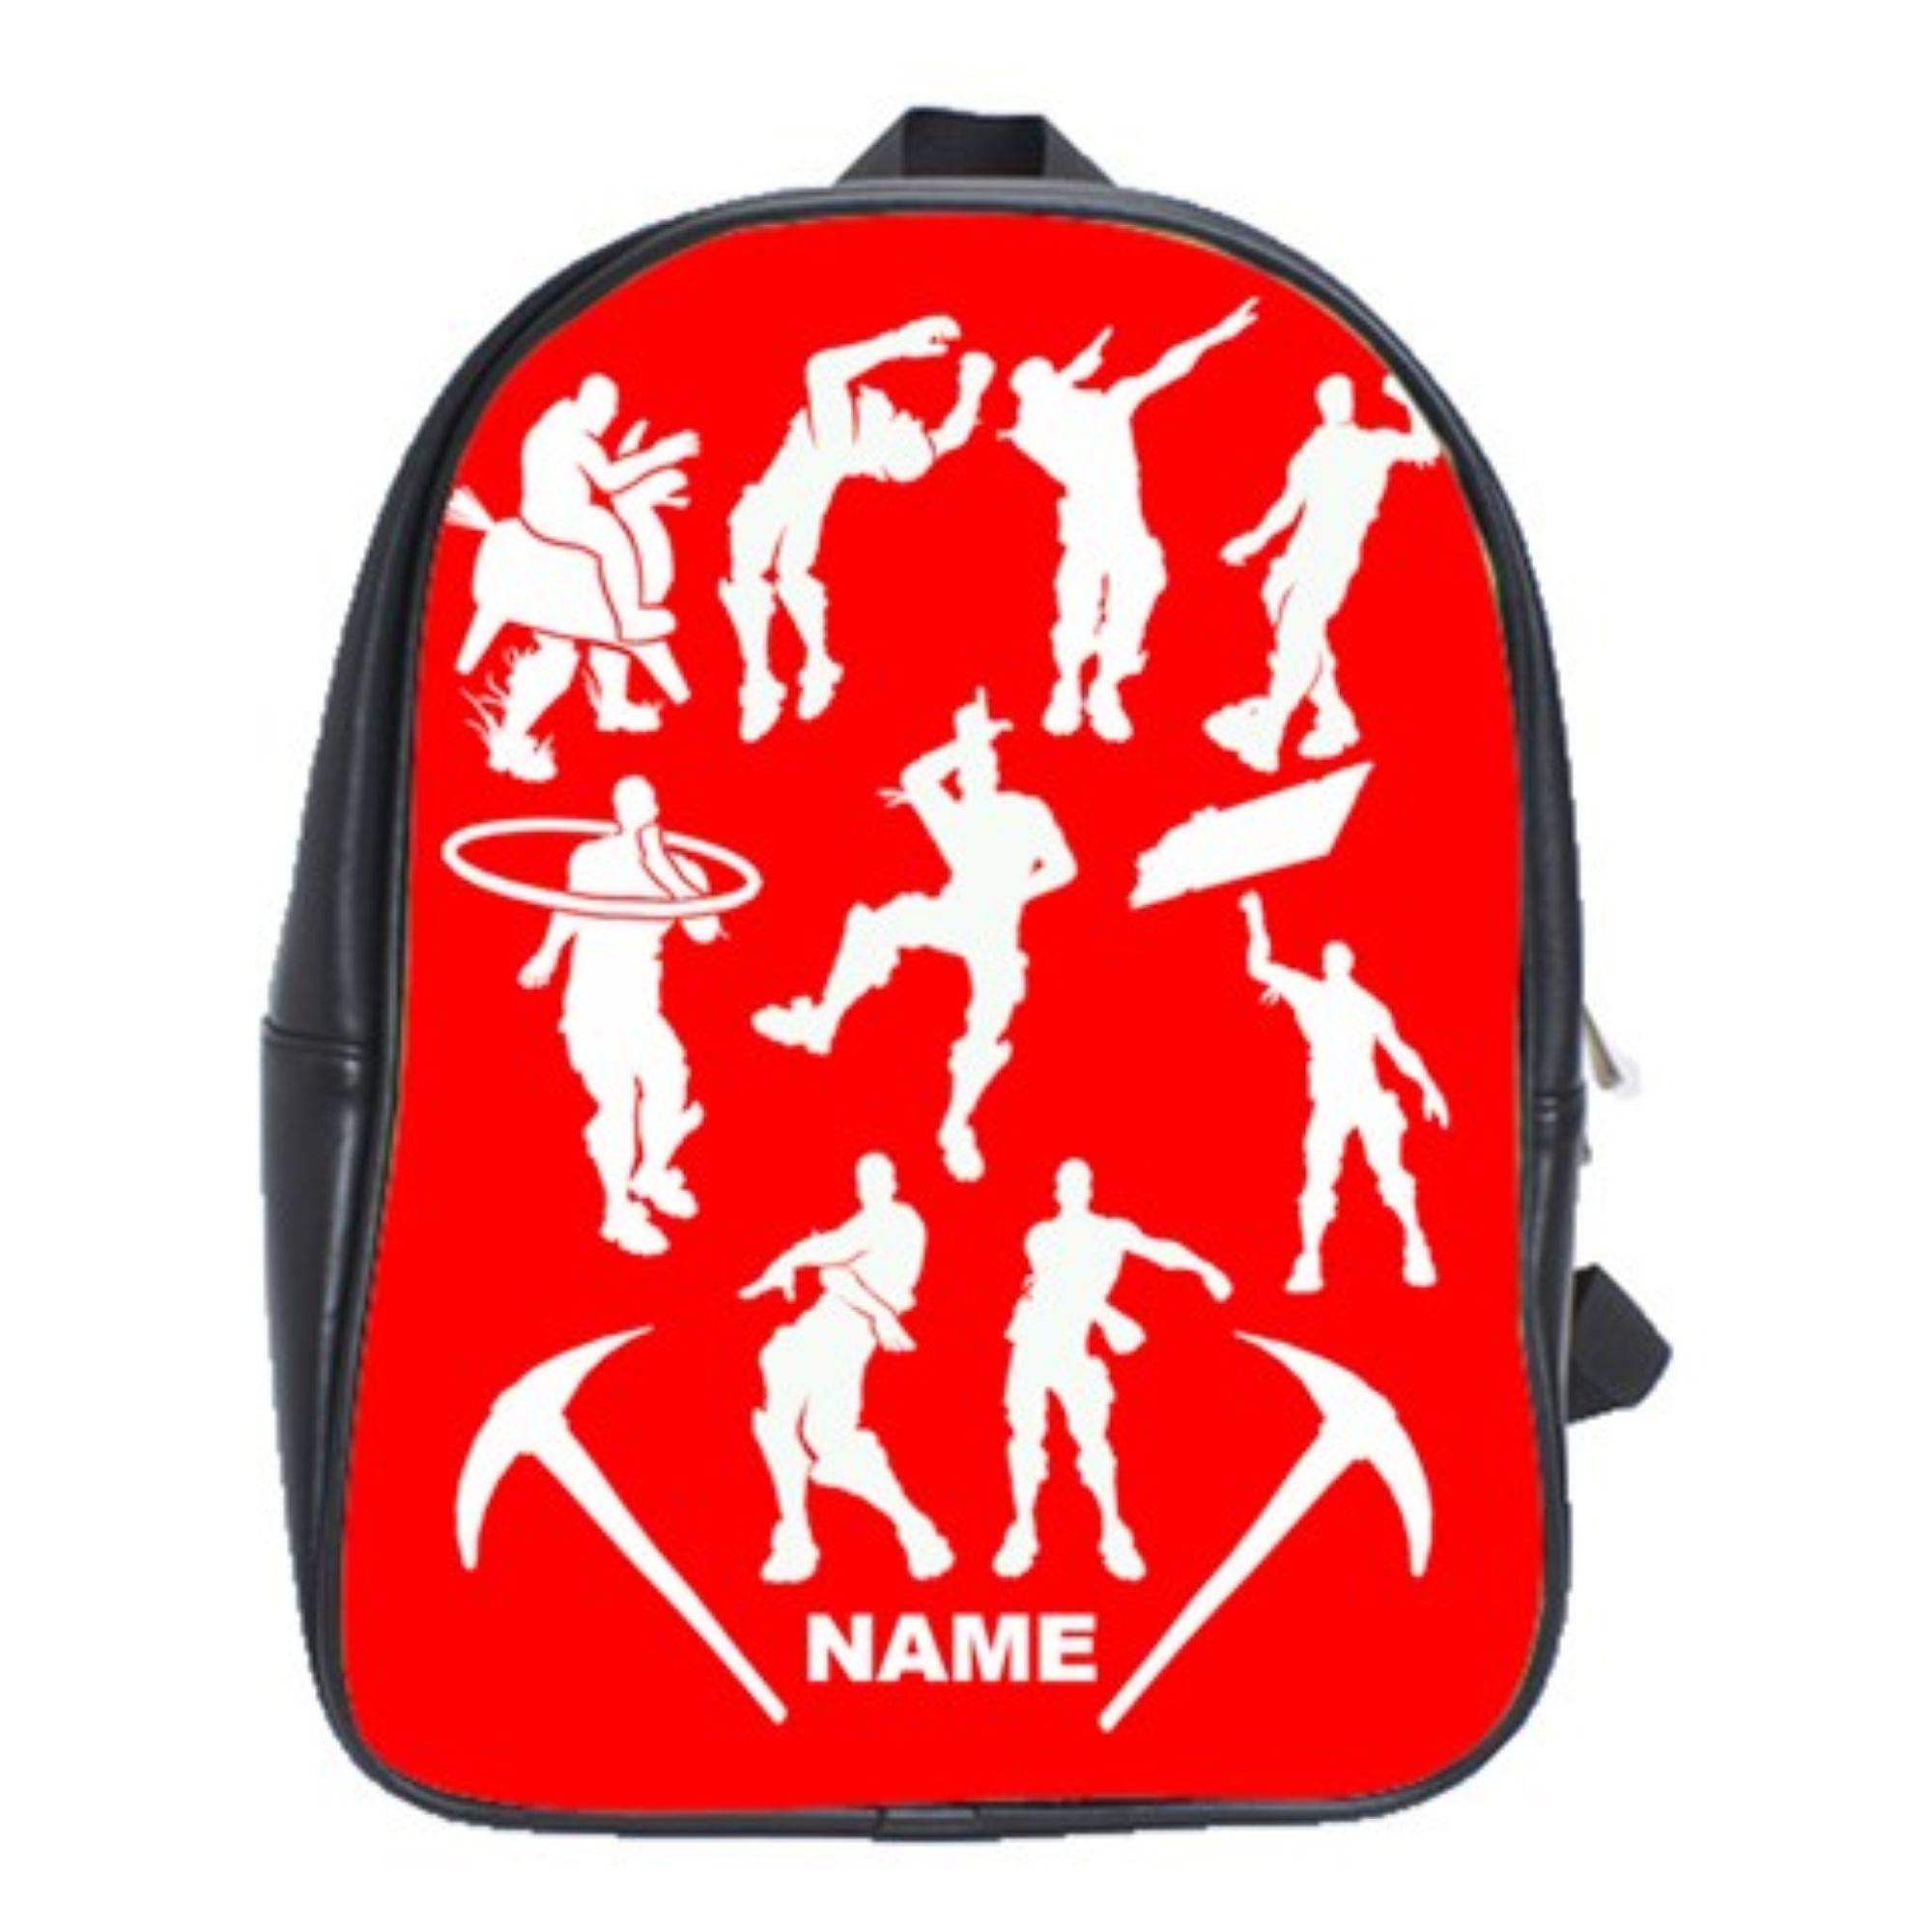 Emote Dancers & Floss 100% Genuine Leather Backpack